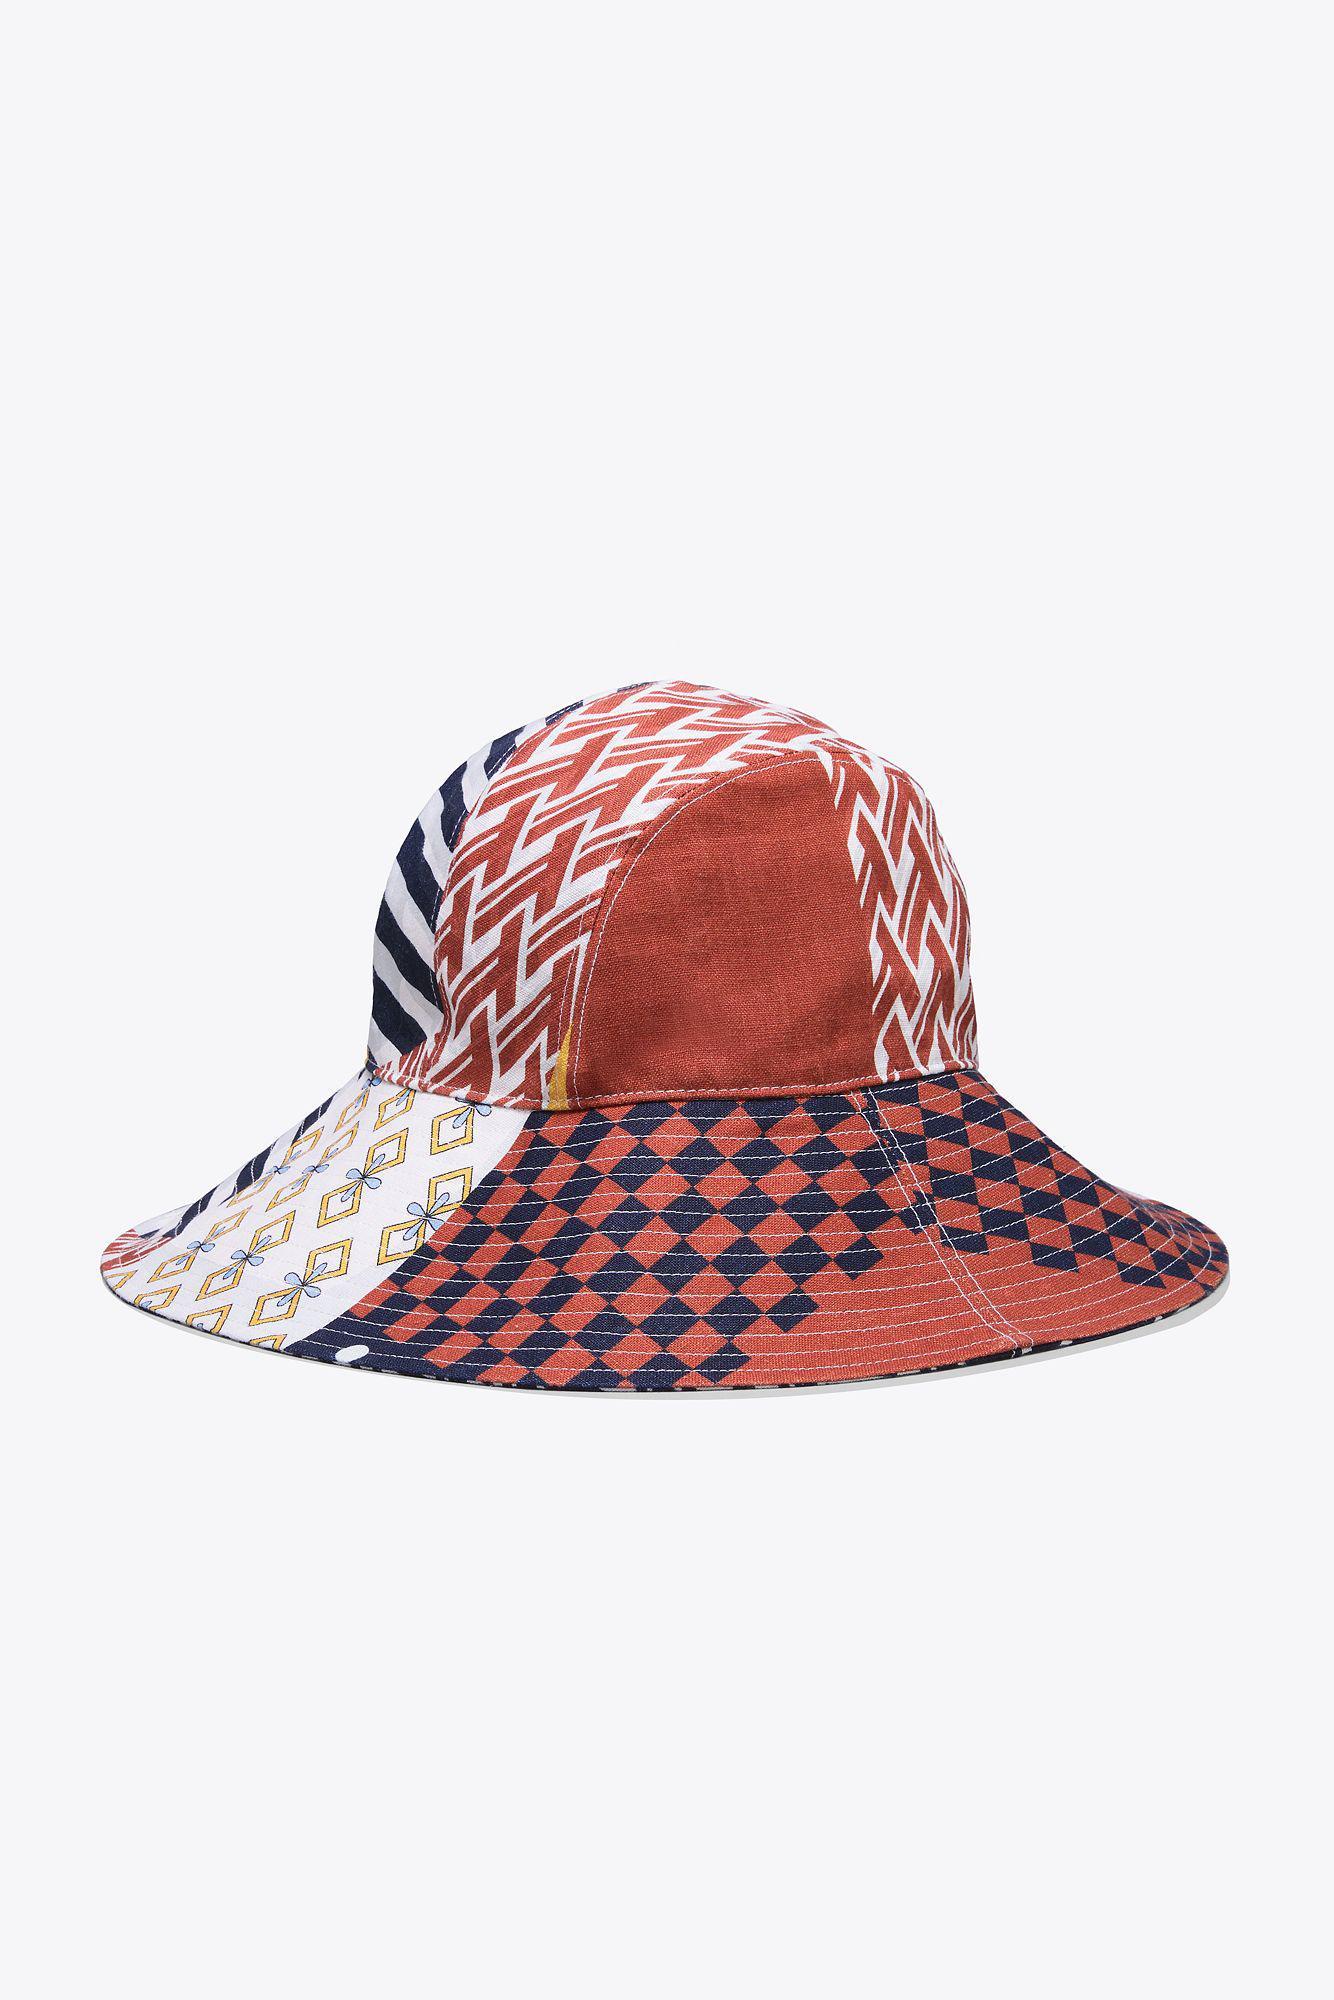 9efa95ec8 Tory Burch Multicolor Floral Patchwork Hat